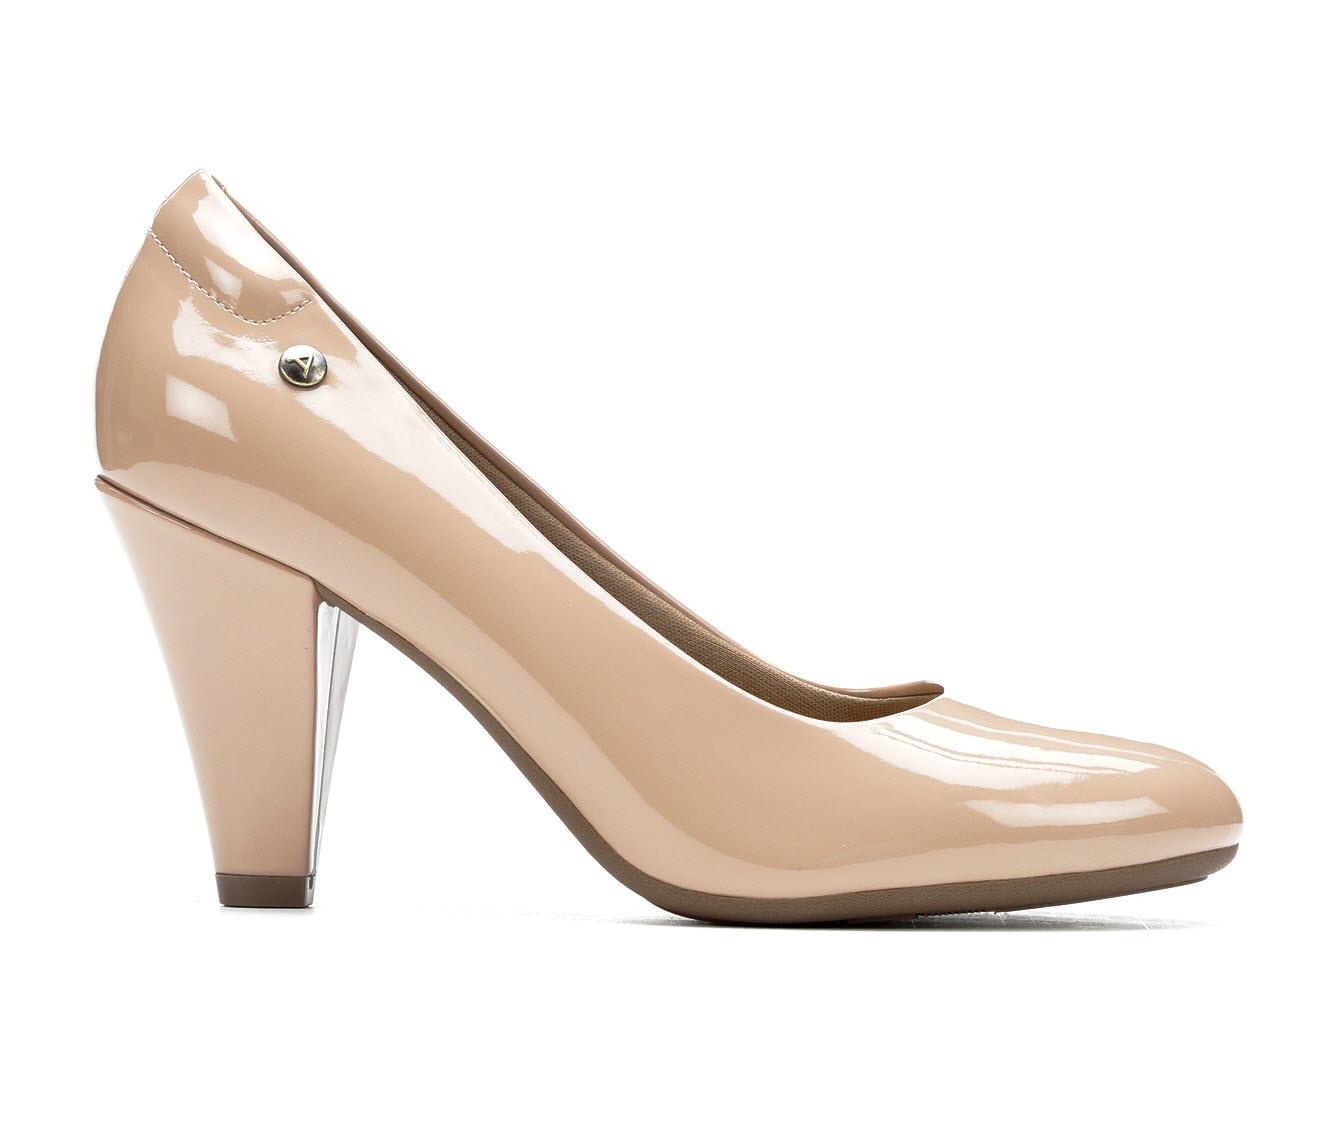 Andiamo Mellie Women's Dress Shoe (Beige Faux Leather)